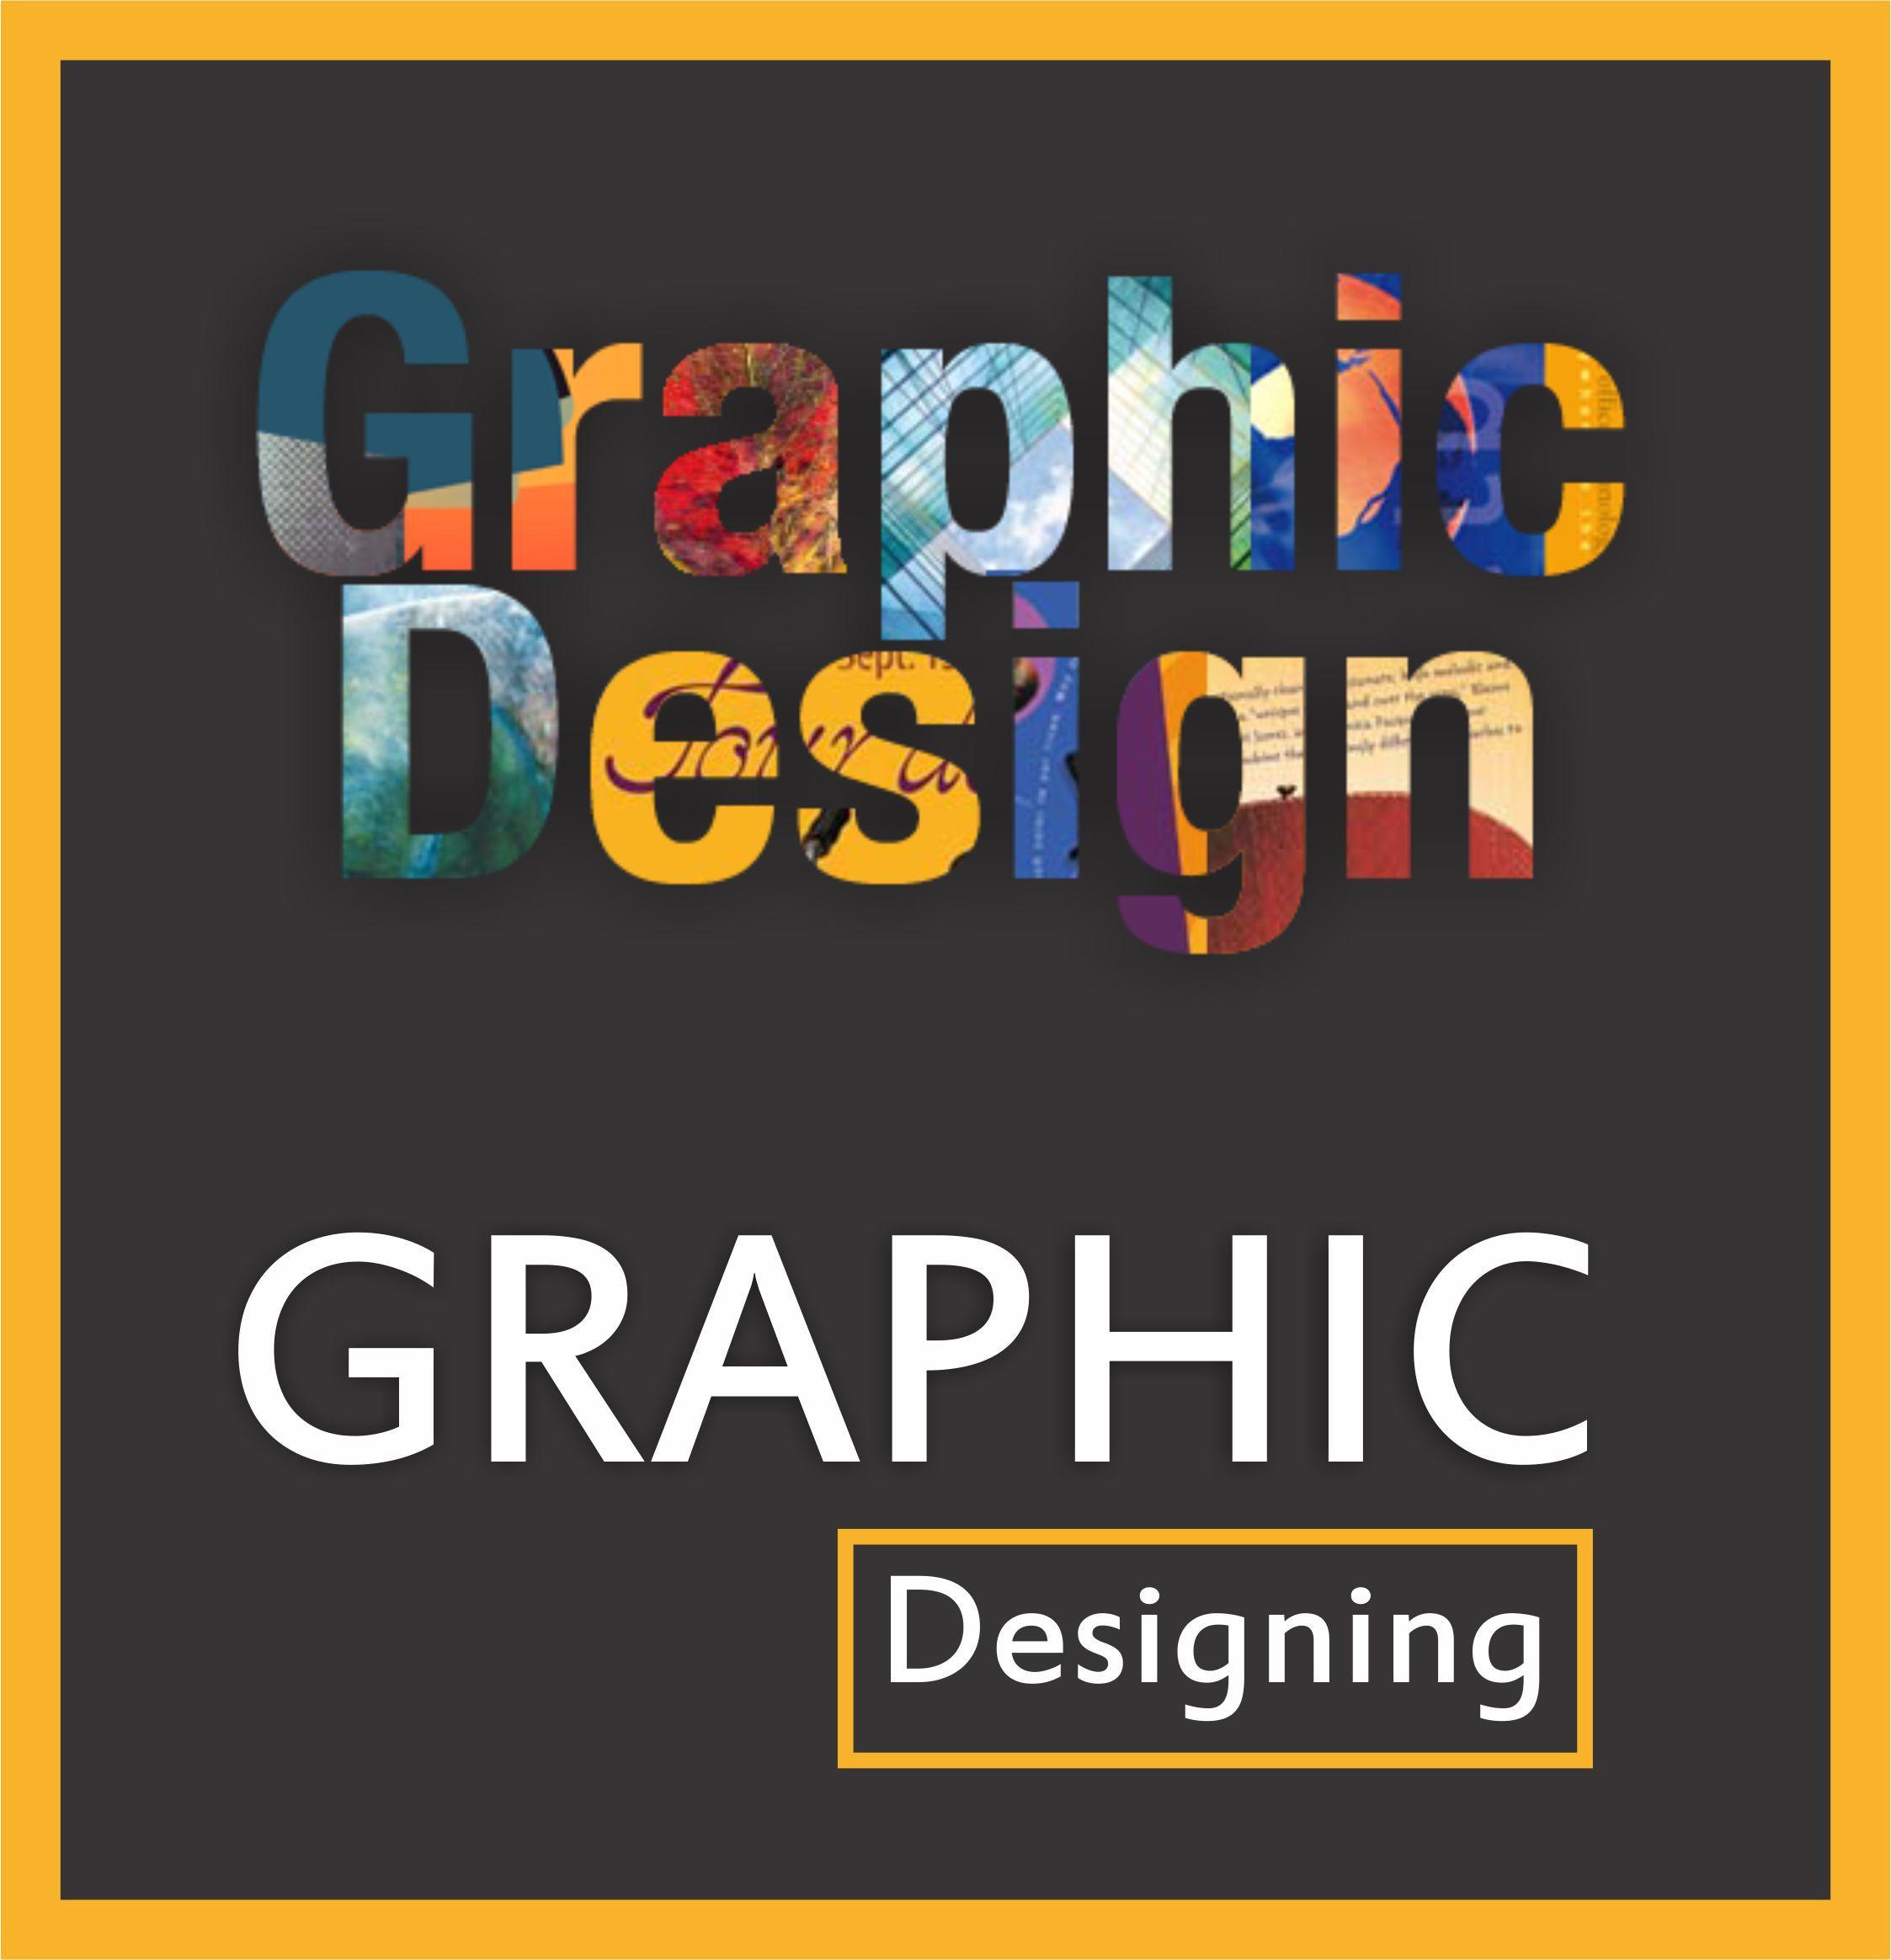 Graphics Designing Company In Pune Imis Graphic Design Jobs Graphic Design Dubai